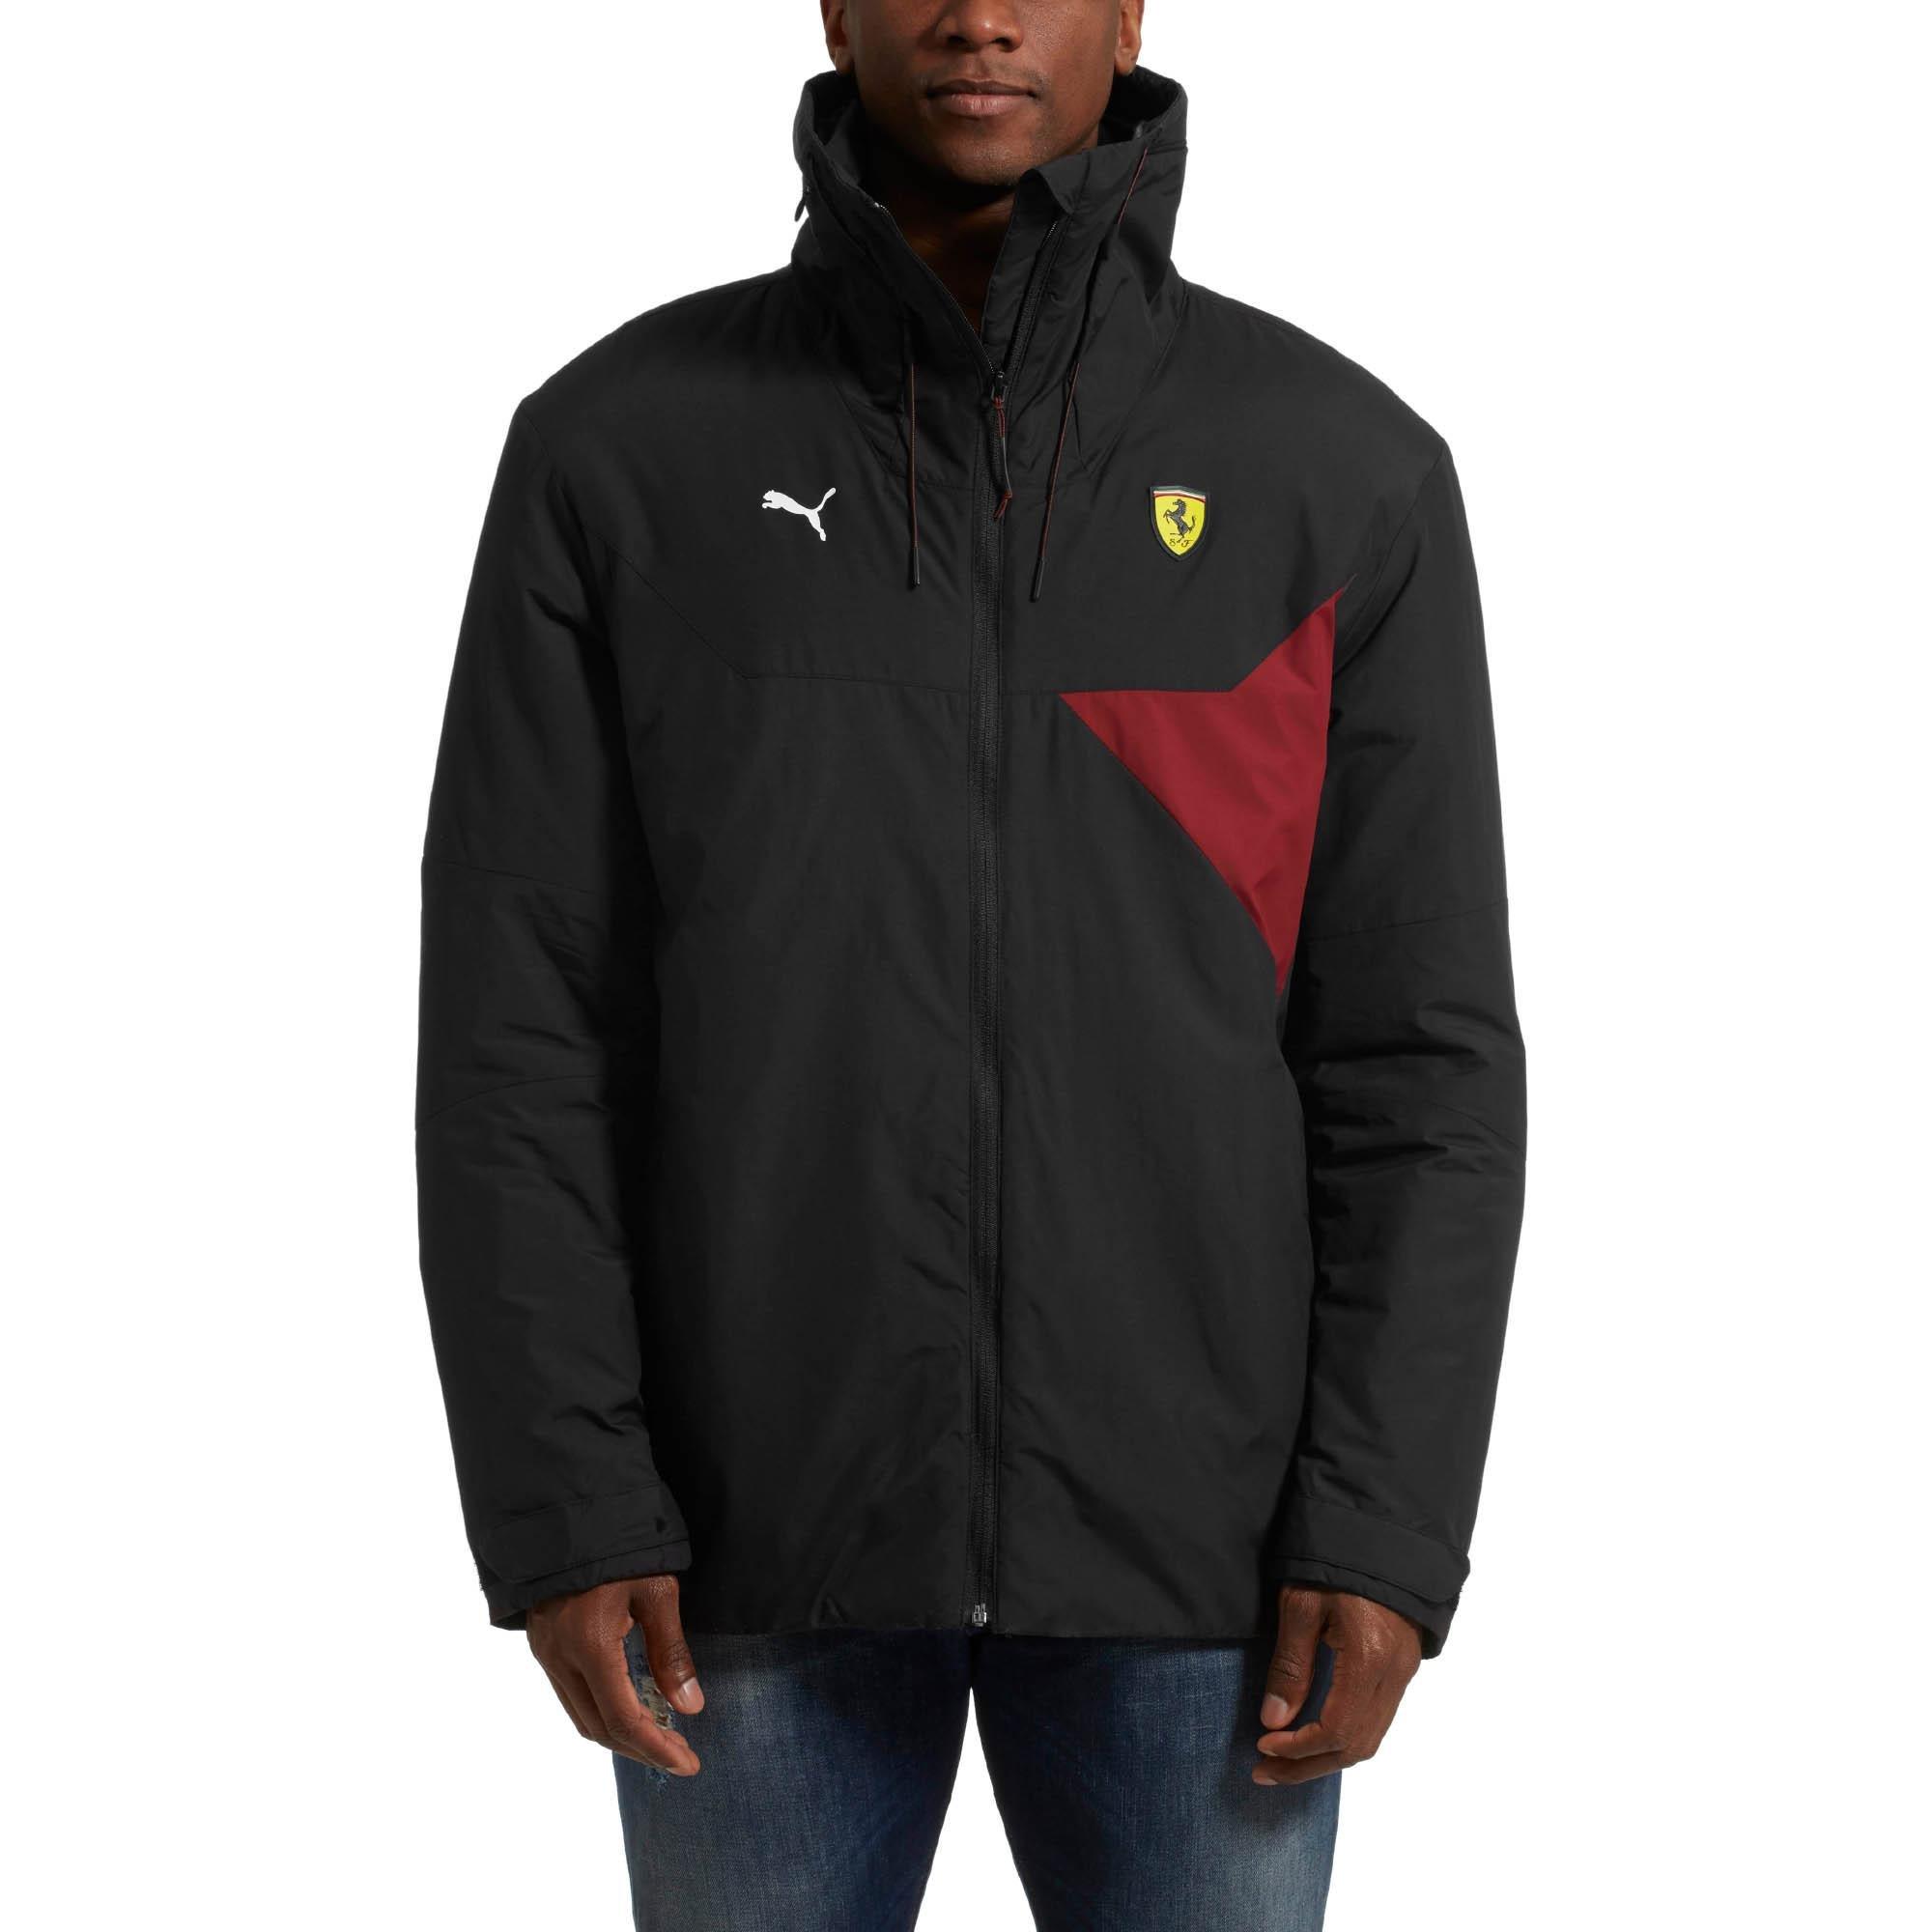 cb9cc3383ed6 Lyst - PUMA Ferrari Rct Zip-up Men s Jacket in Black for Men